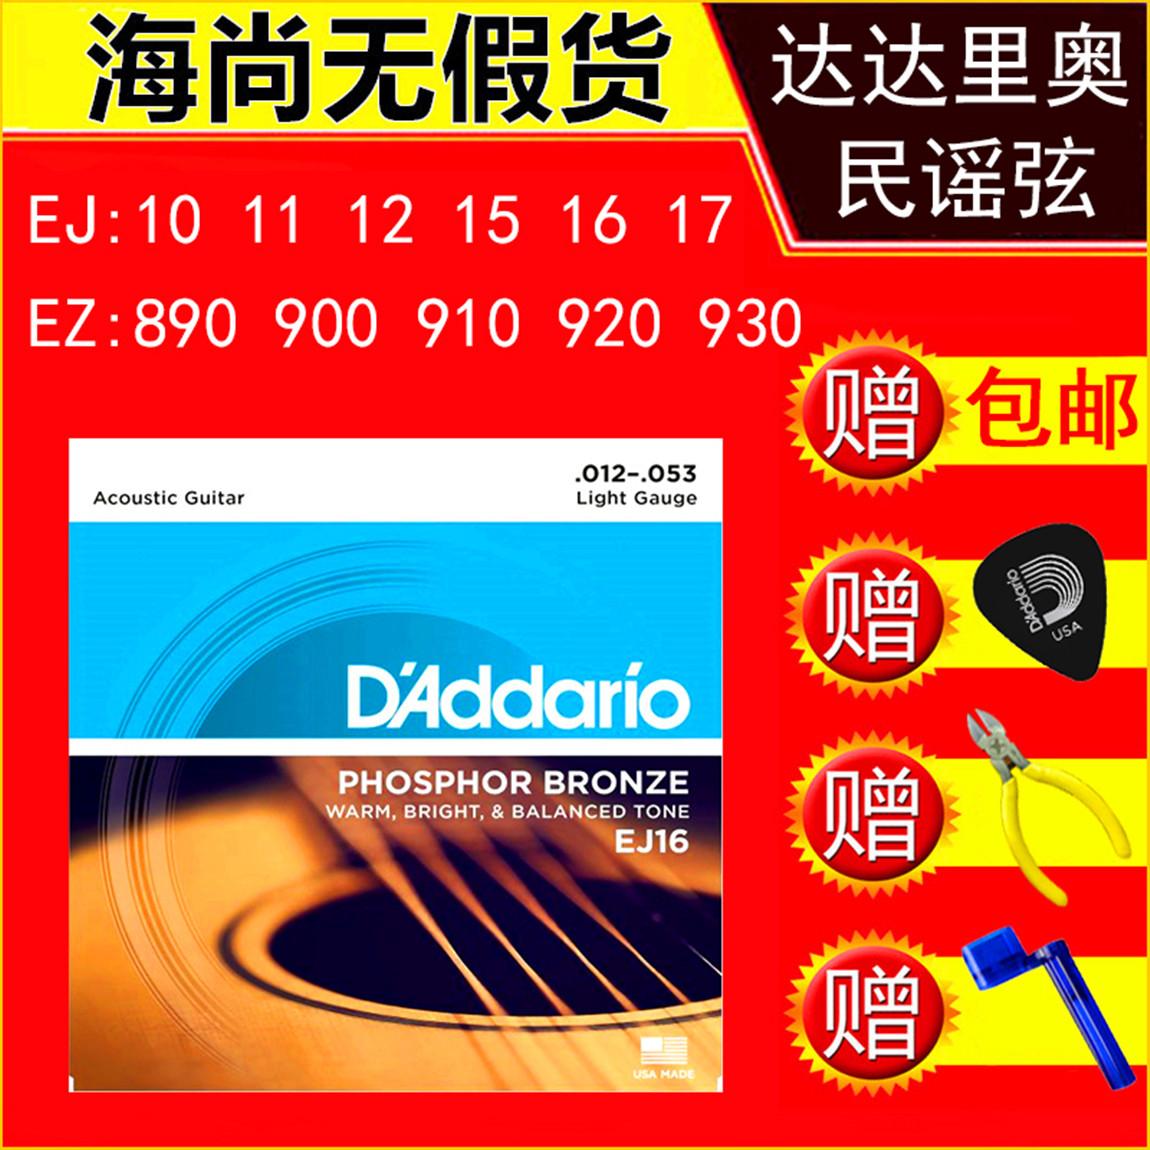 D'Addario Strings Folk Guitar Strings Электрические гитарные струны Гитарные струны EZ890 910 920 EJ15 16